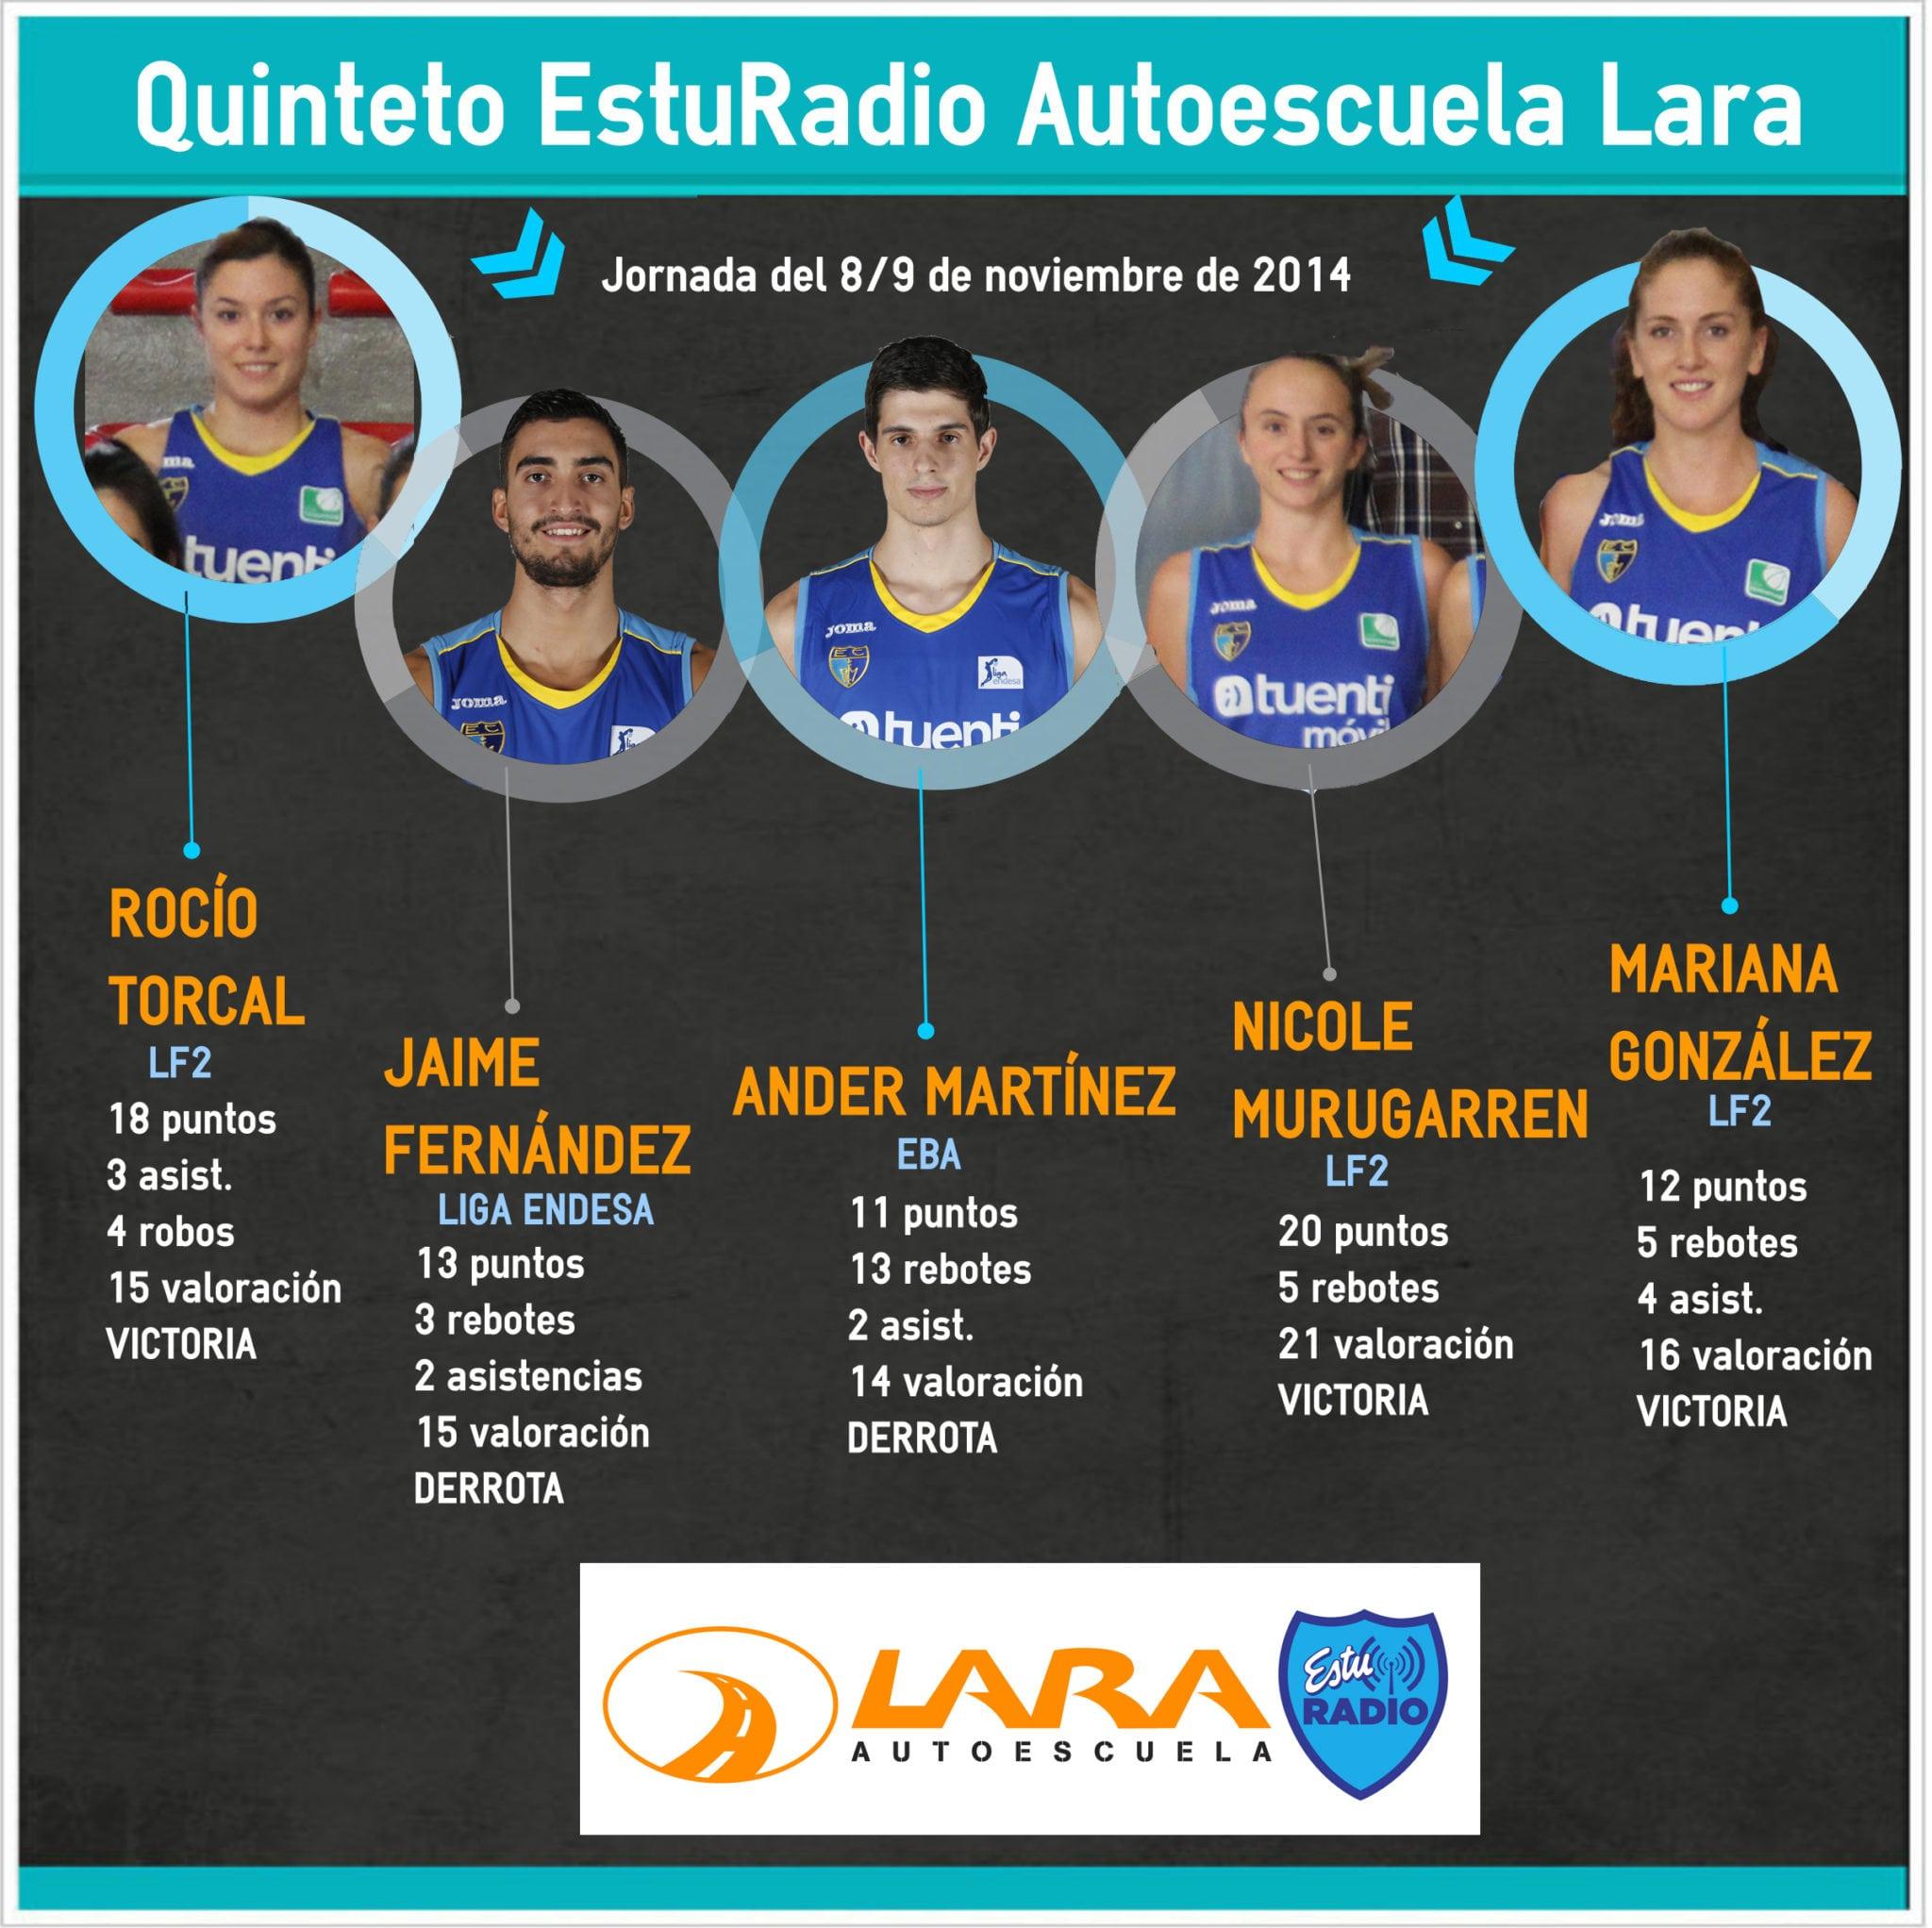 Quinteto Autoescuela Lara EstuRadio: Torcal, Fernández, Martínez, Murugarren y González